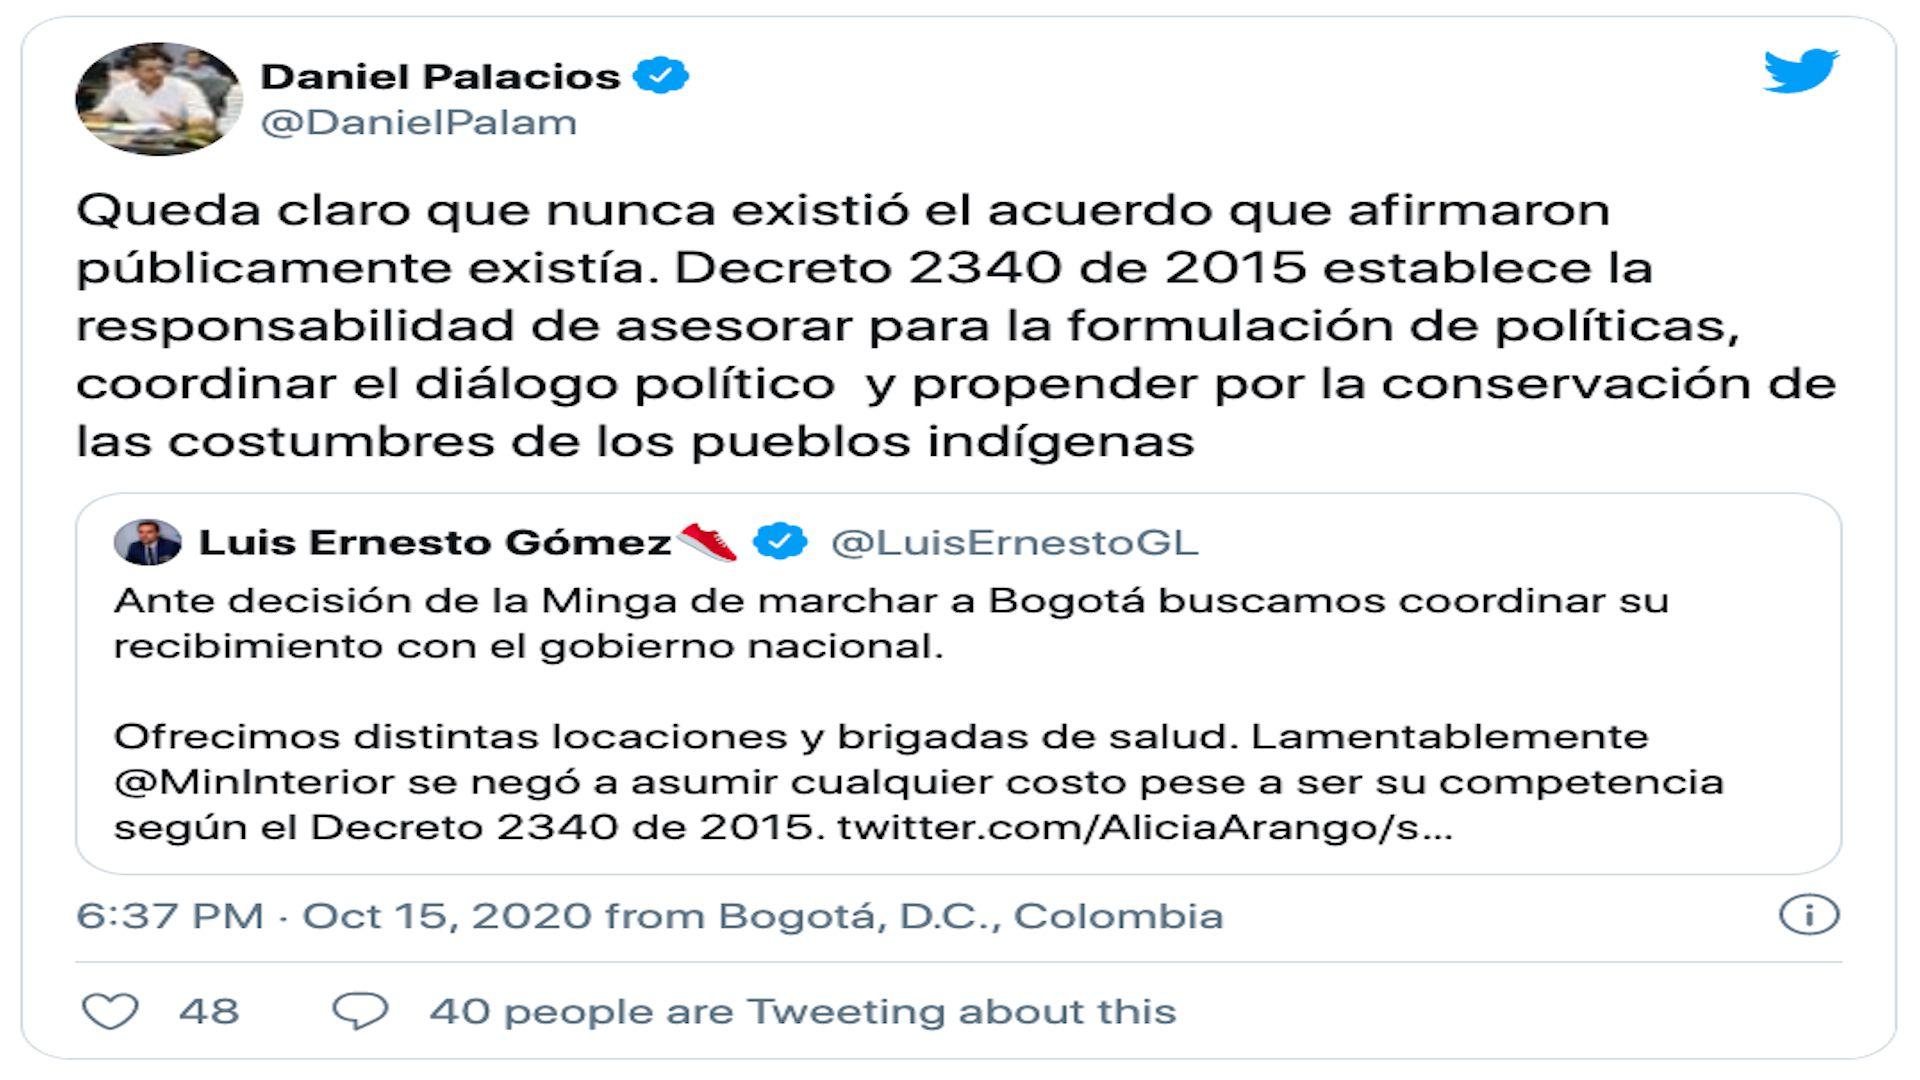 Daniel Palacios, Viceministro de Interior / (Twitter: @DanielPalam).